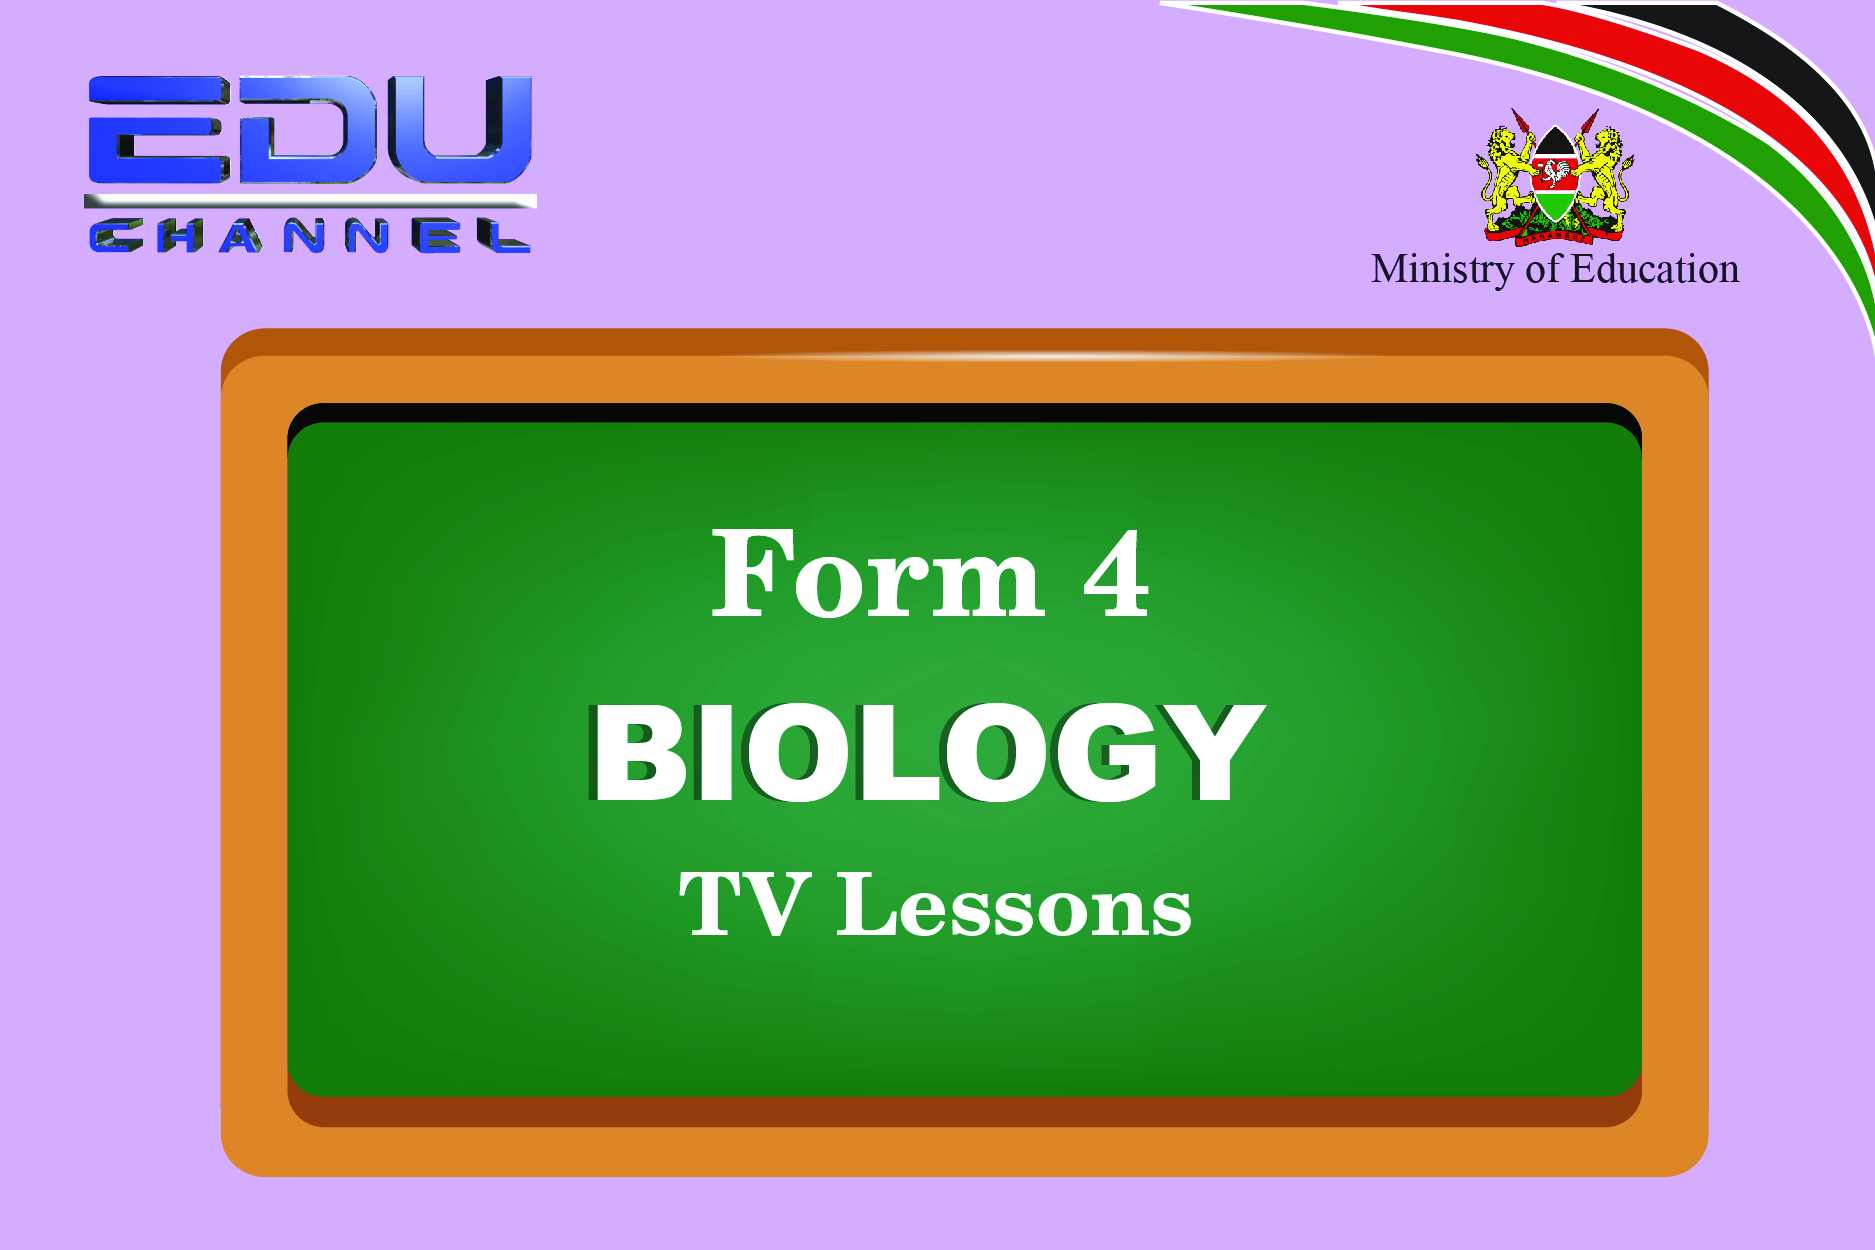 Form 4 Biology Lesson 4:The Nervous System